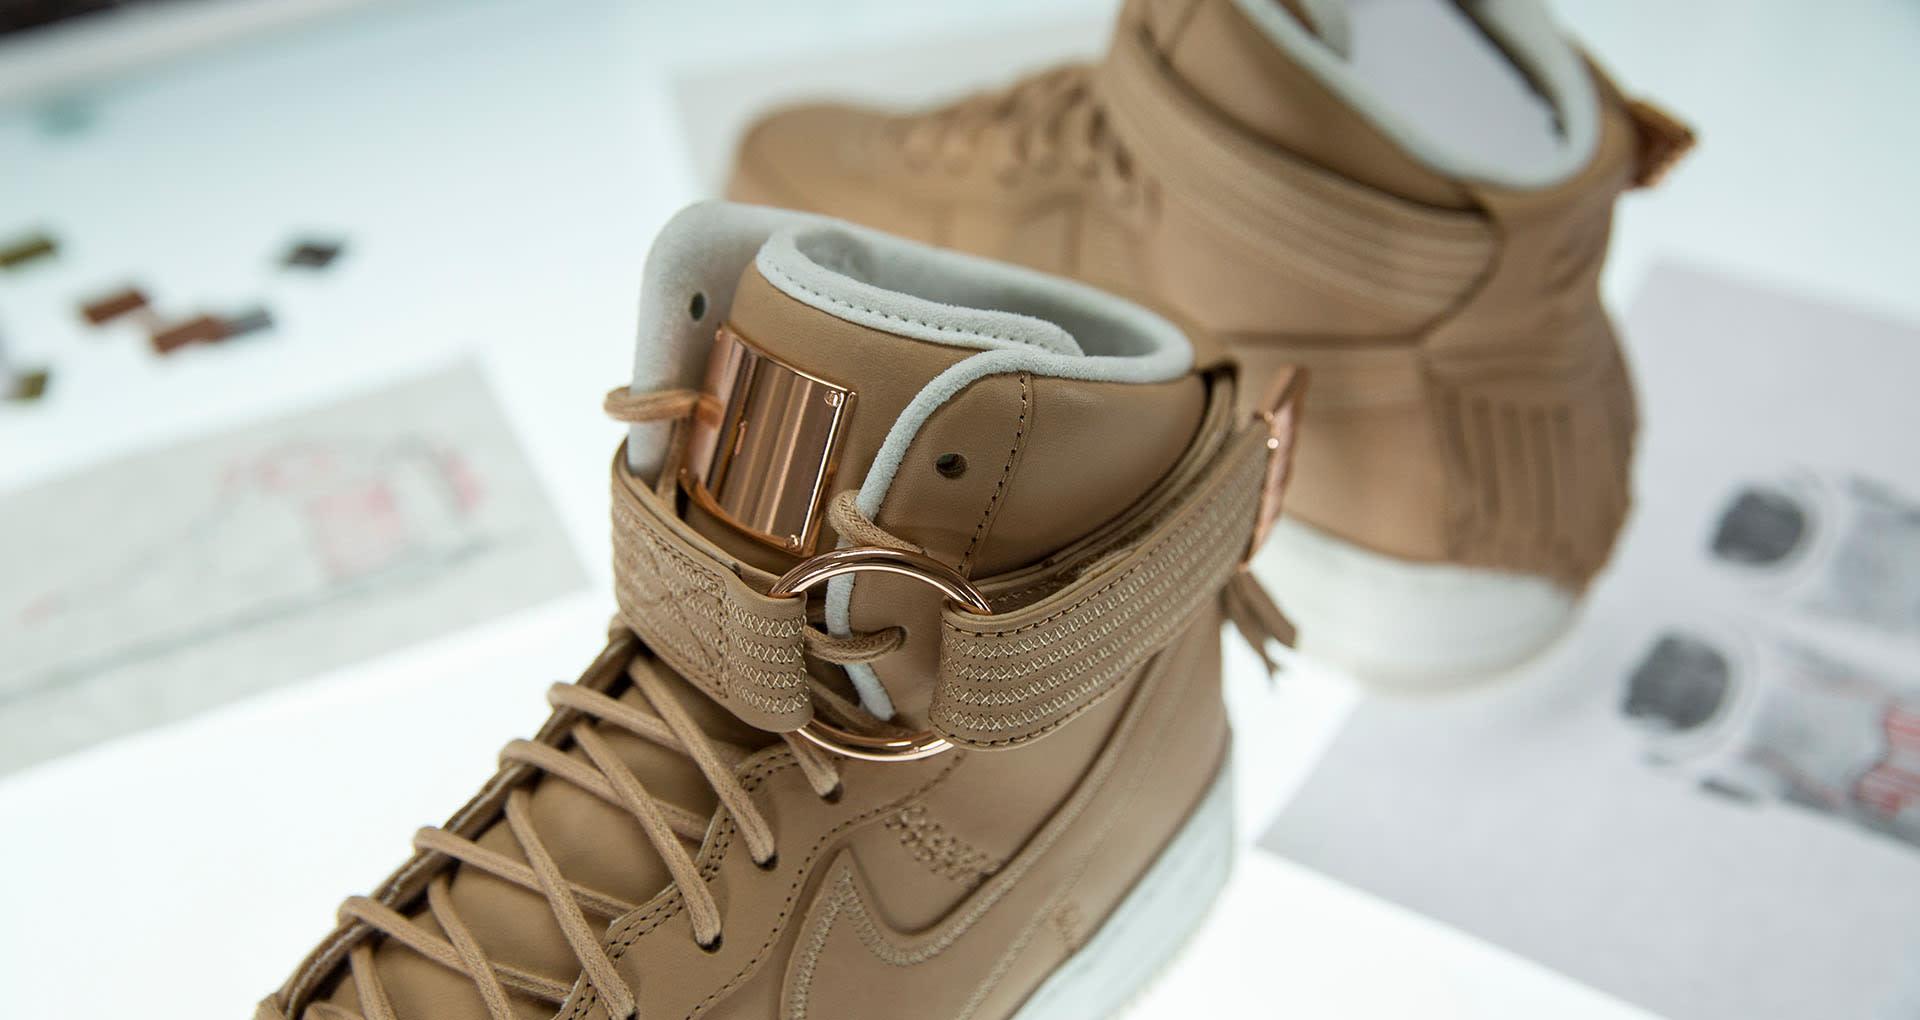 ce93e7c1b915 Image via Nike Nike Air Force 1 Sport Luxury Vachetta Tan Tongue